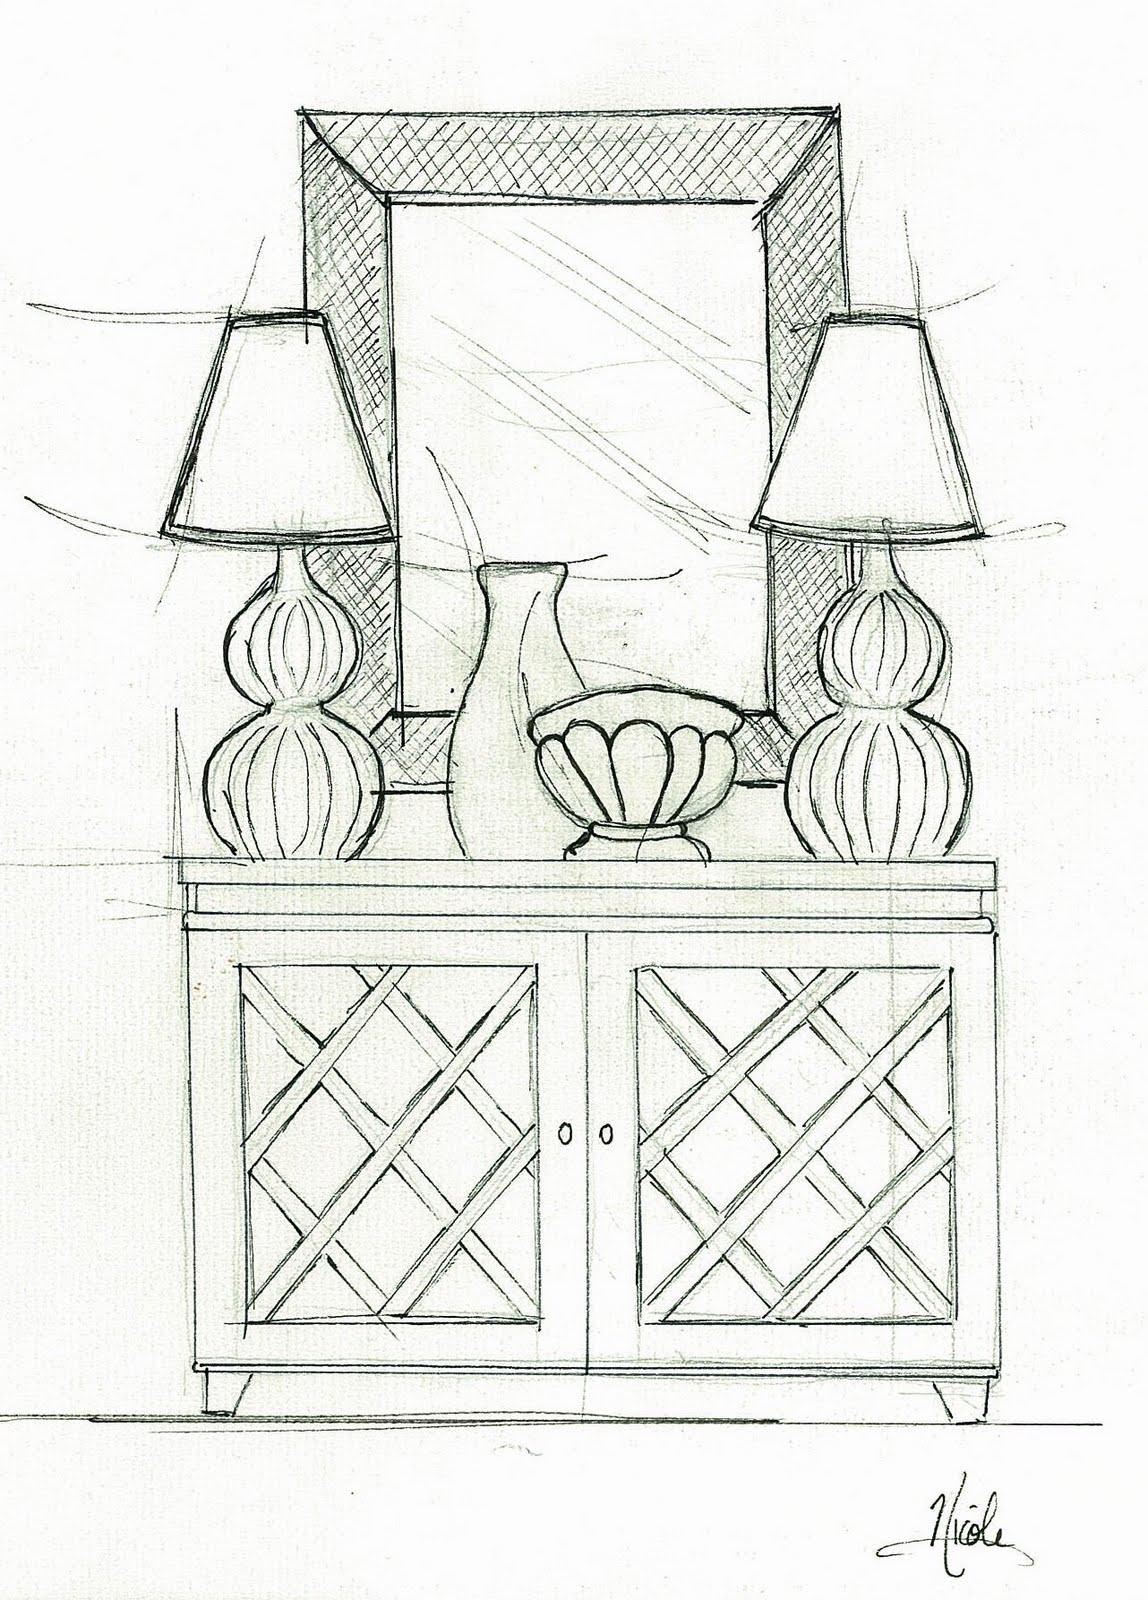 Furniture Sketches Interior Design An Elevation Concept Sketch To ...